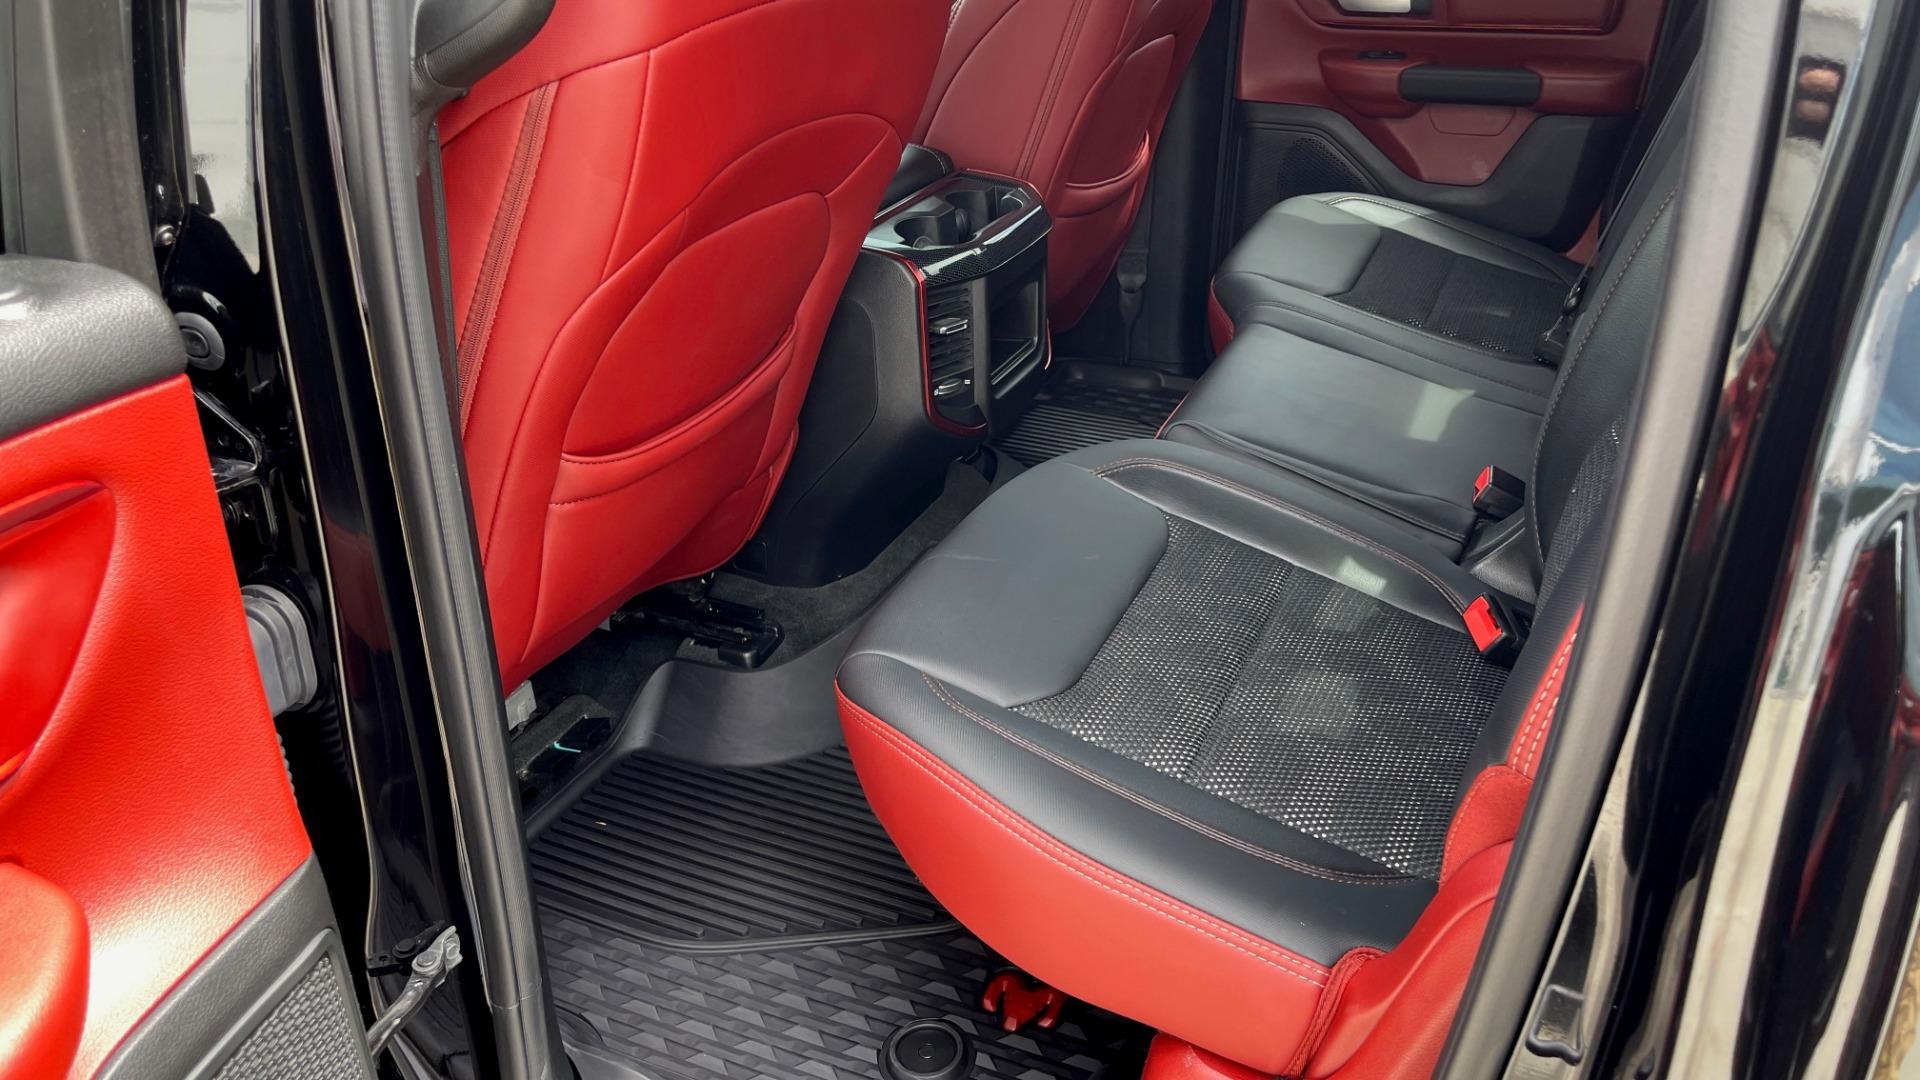 Used 2019 Ram 1500 REBEL QUADCAB 4X4 / 5.7L HEMI / 8-SPD AUTO / REMOTE START / PARK ASSIST for sale $44,495 at Formula Imports in Charlotte NC 28227 53